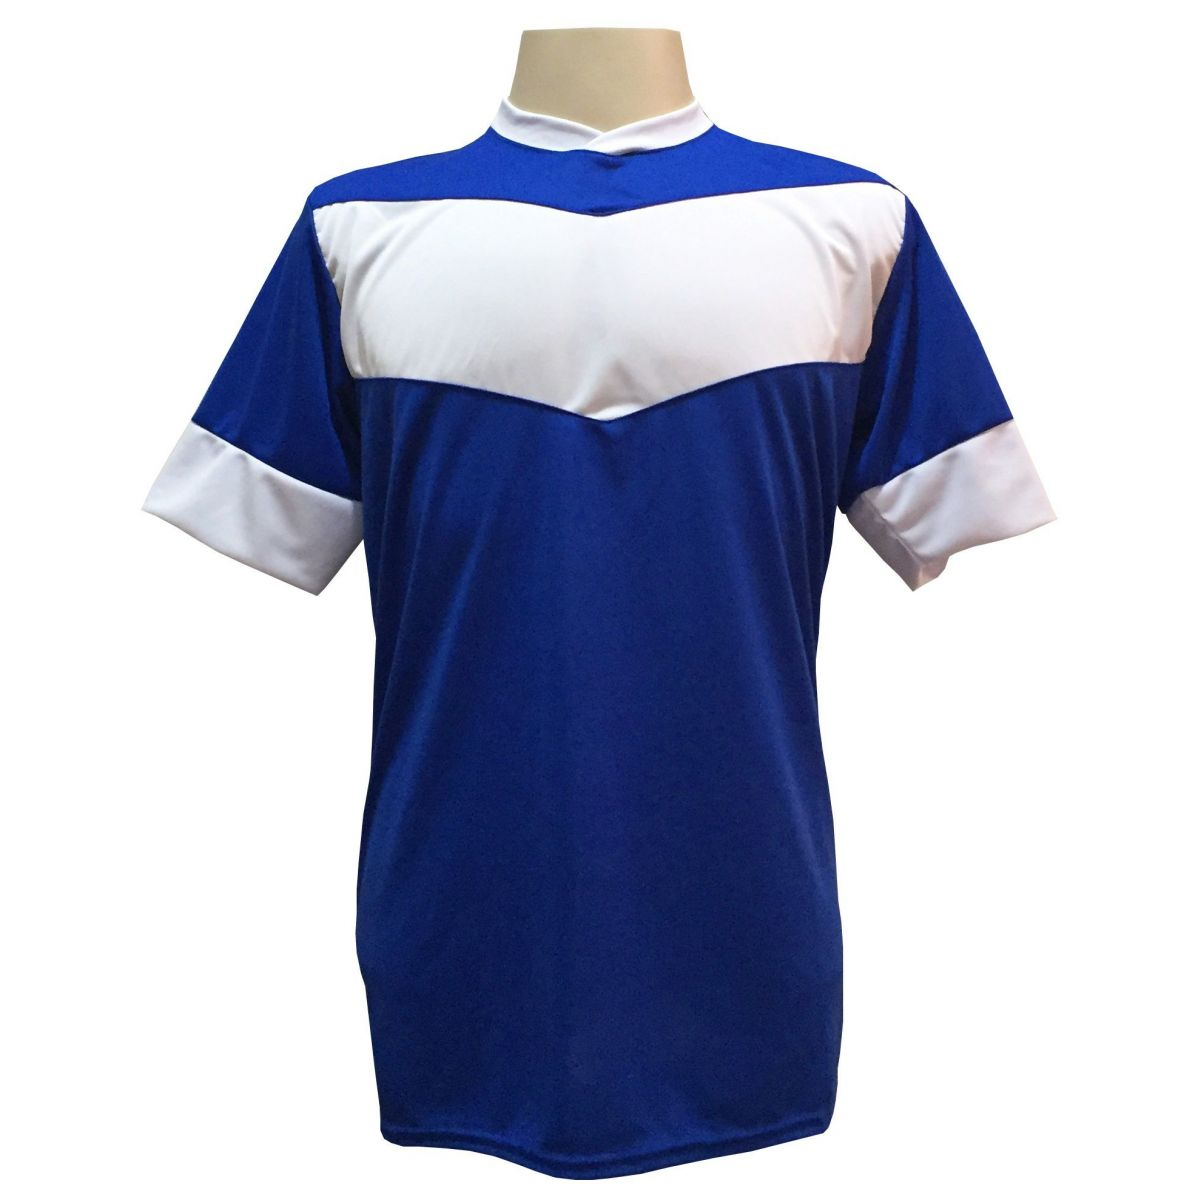 Jogo de Camisa com 18 unidades modelo Columbus Royal/Branco + Brindes